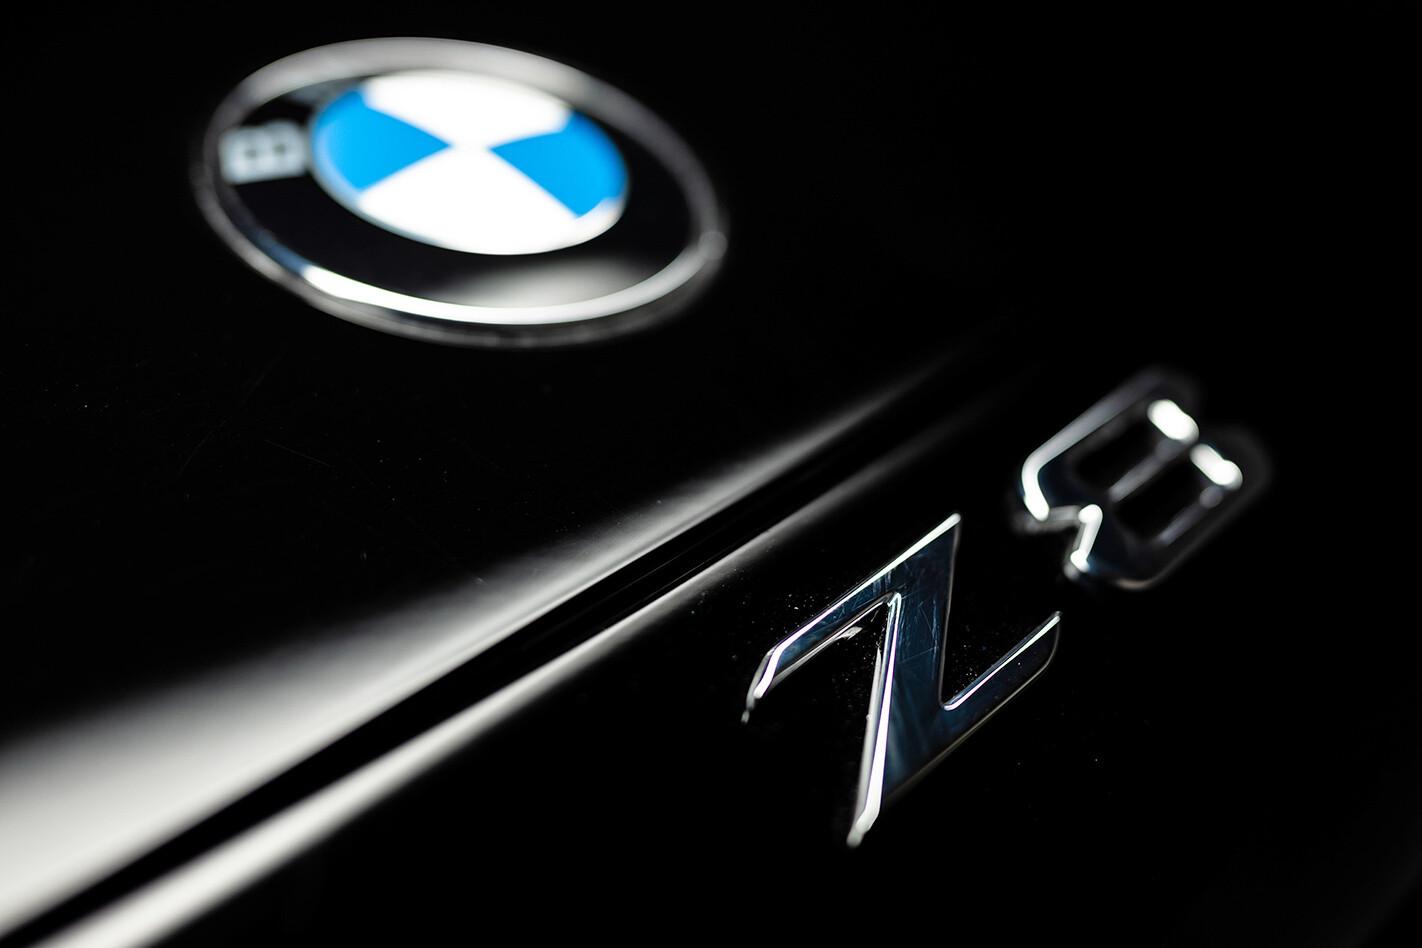 BMW Z8 badge